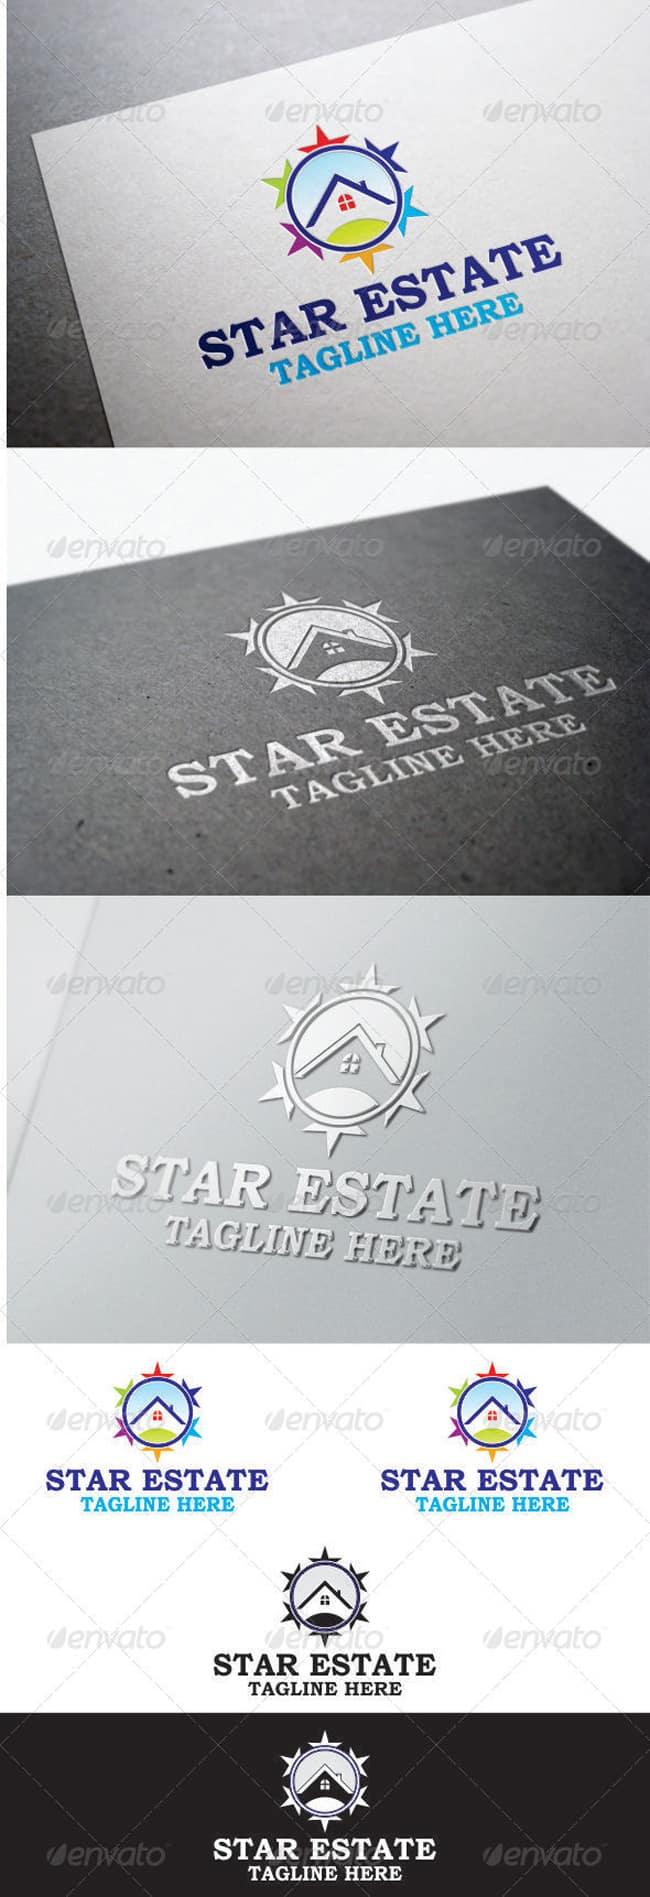 Star Estate